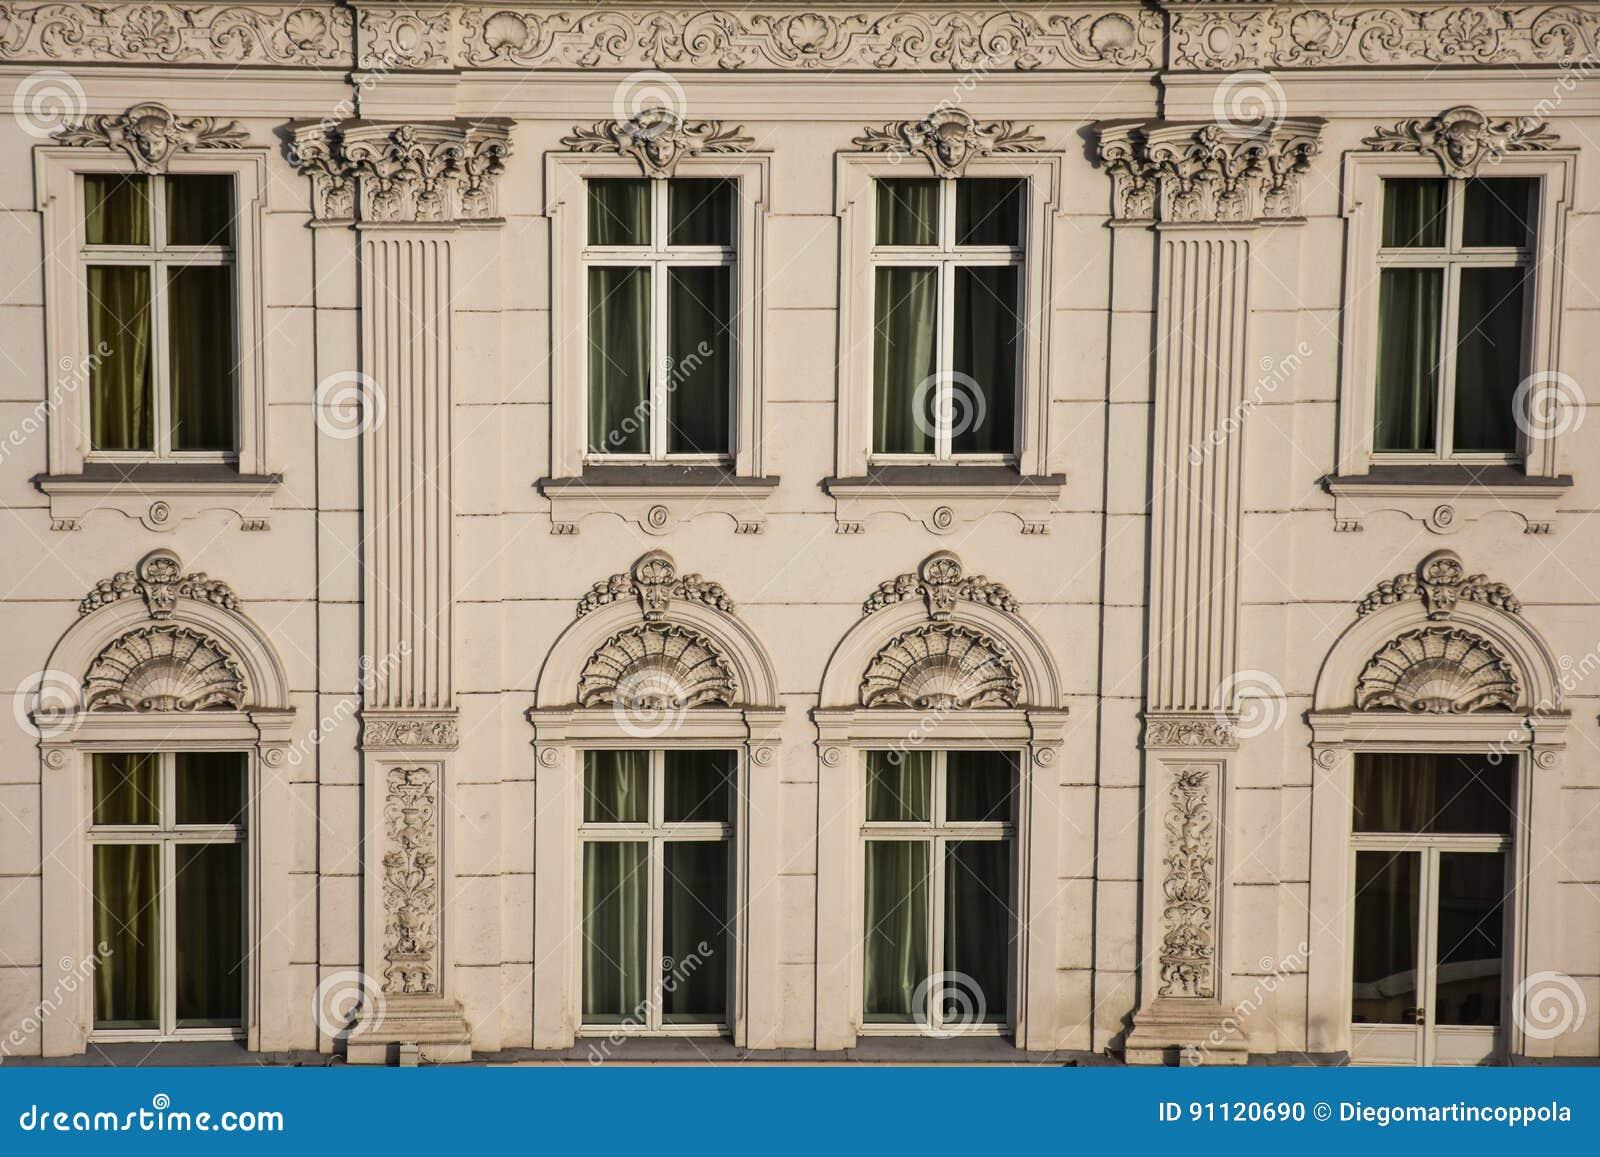 Stara Fasada Budynku Zdjecie Stock Obraz Zlozonej Z Ulga 91120690